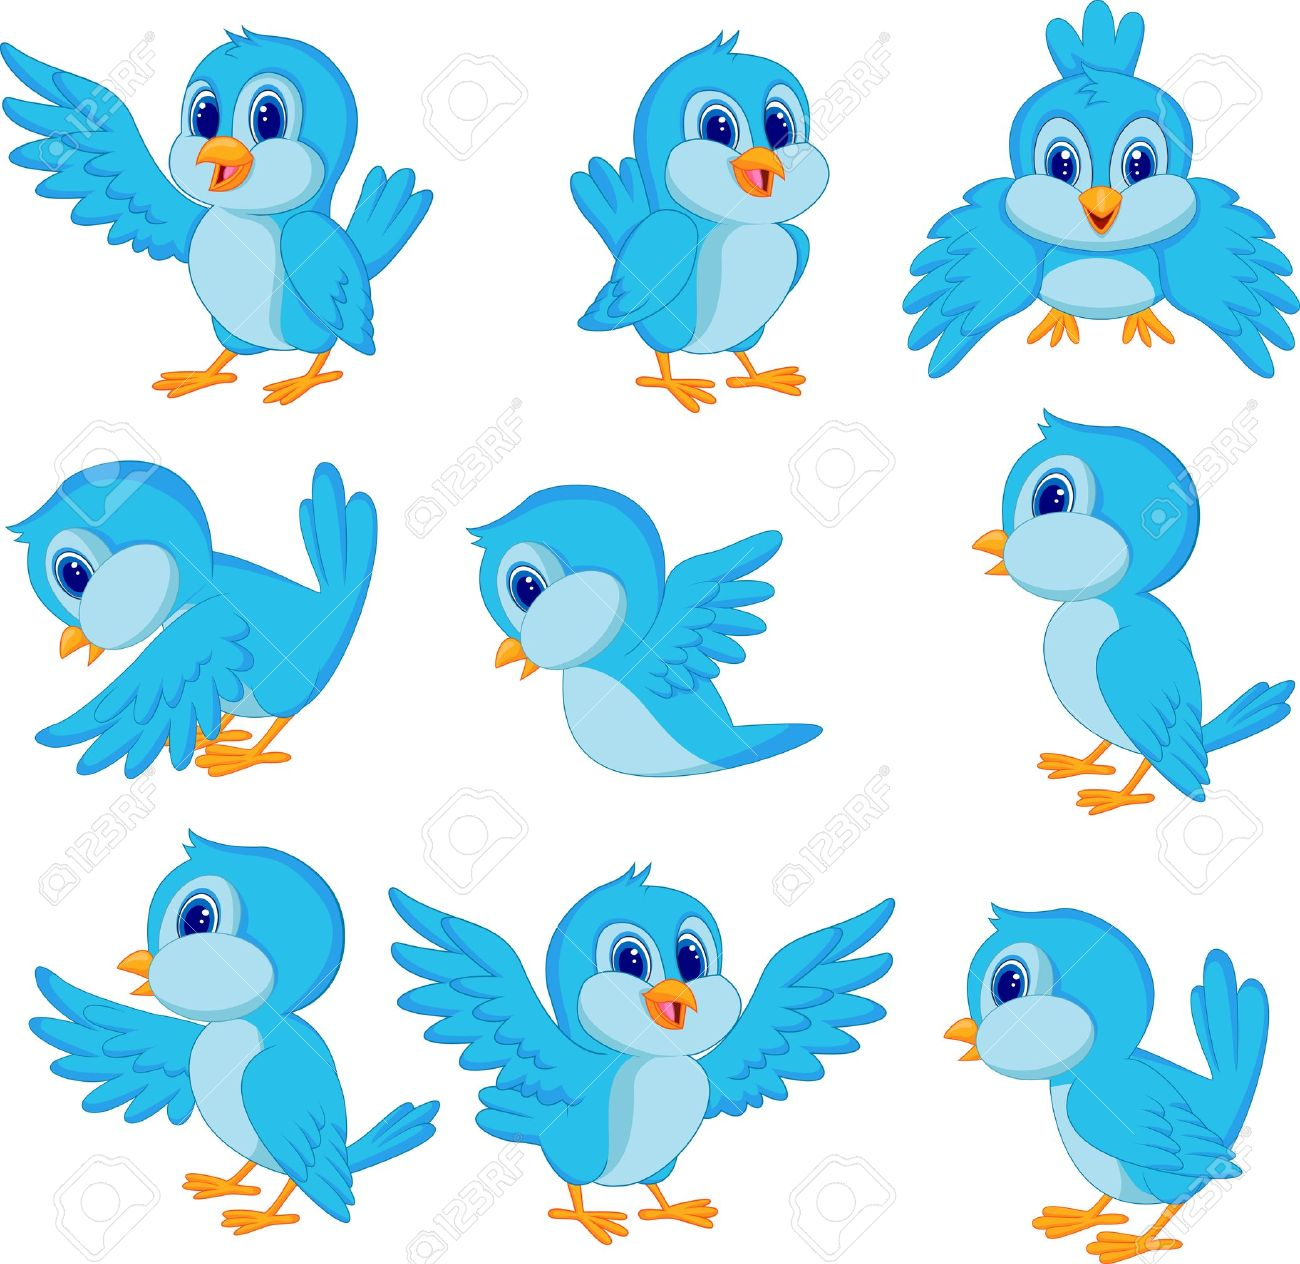 Cute blue bird cartoon.